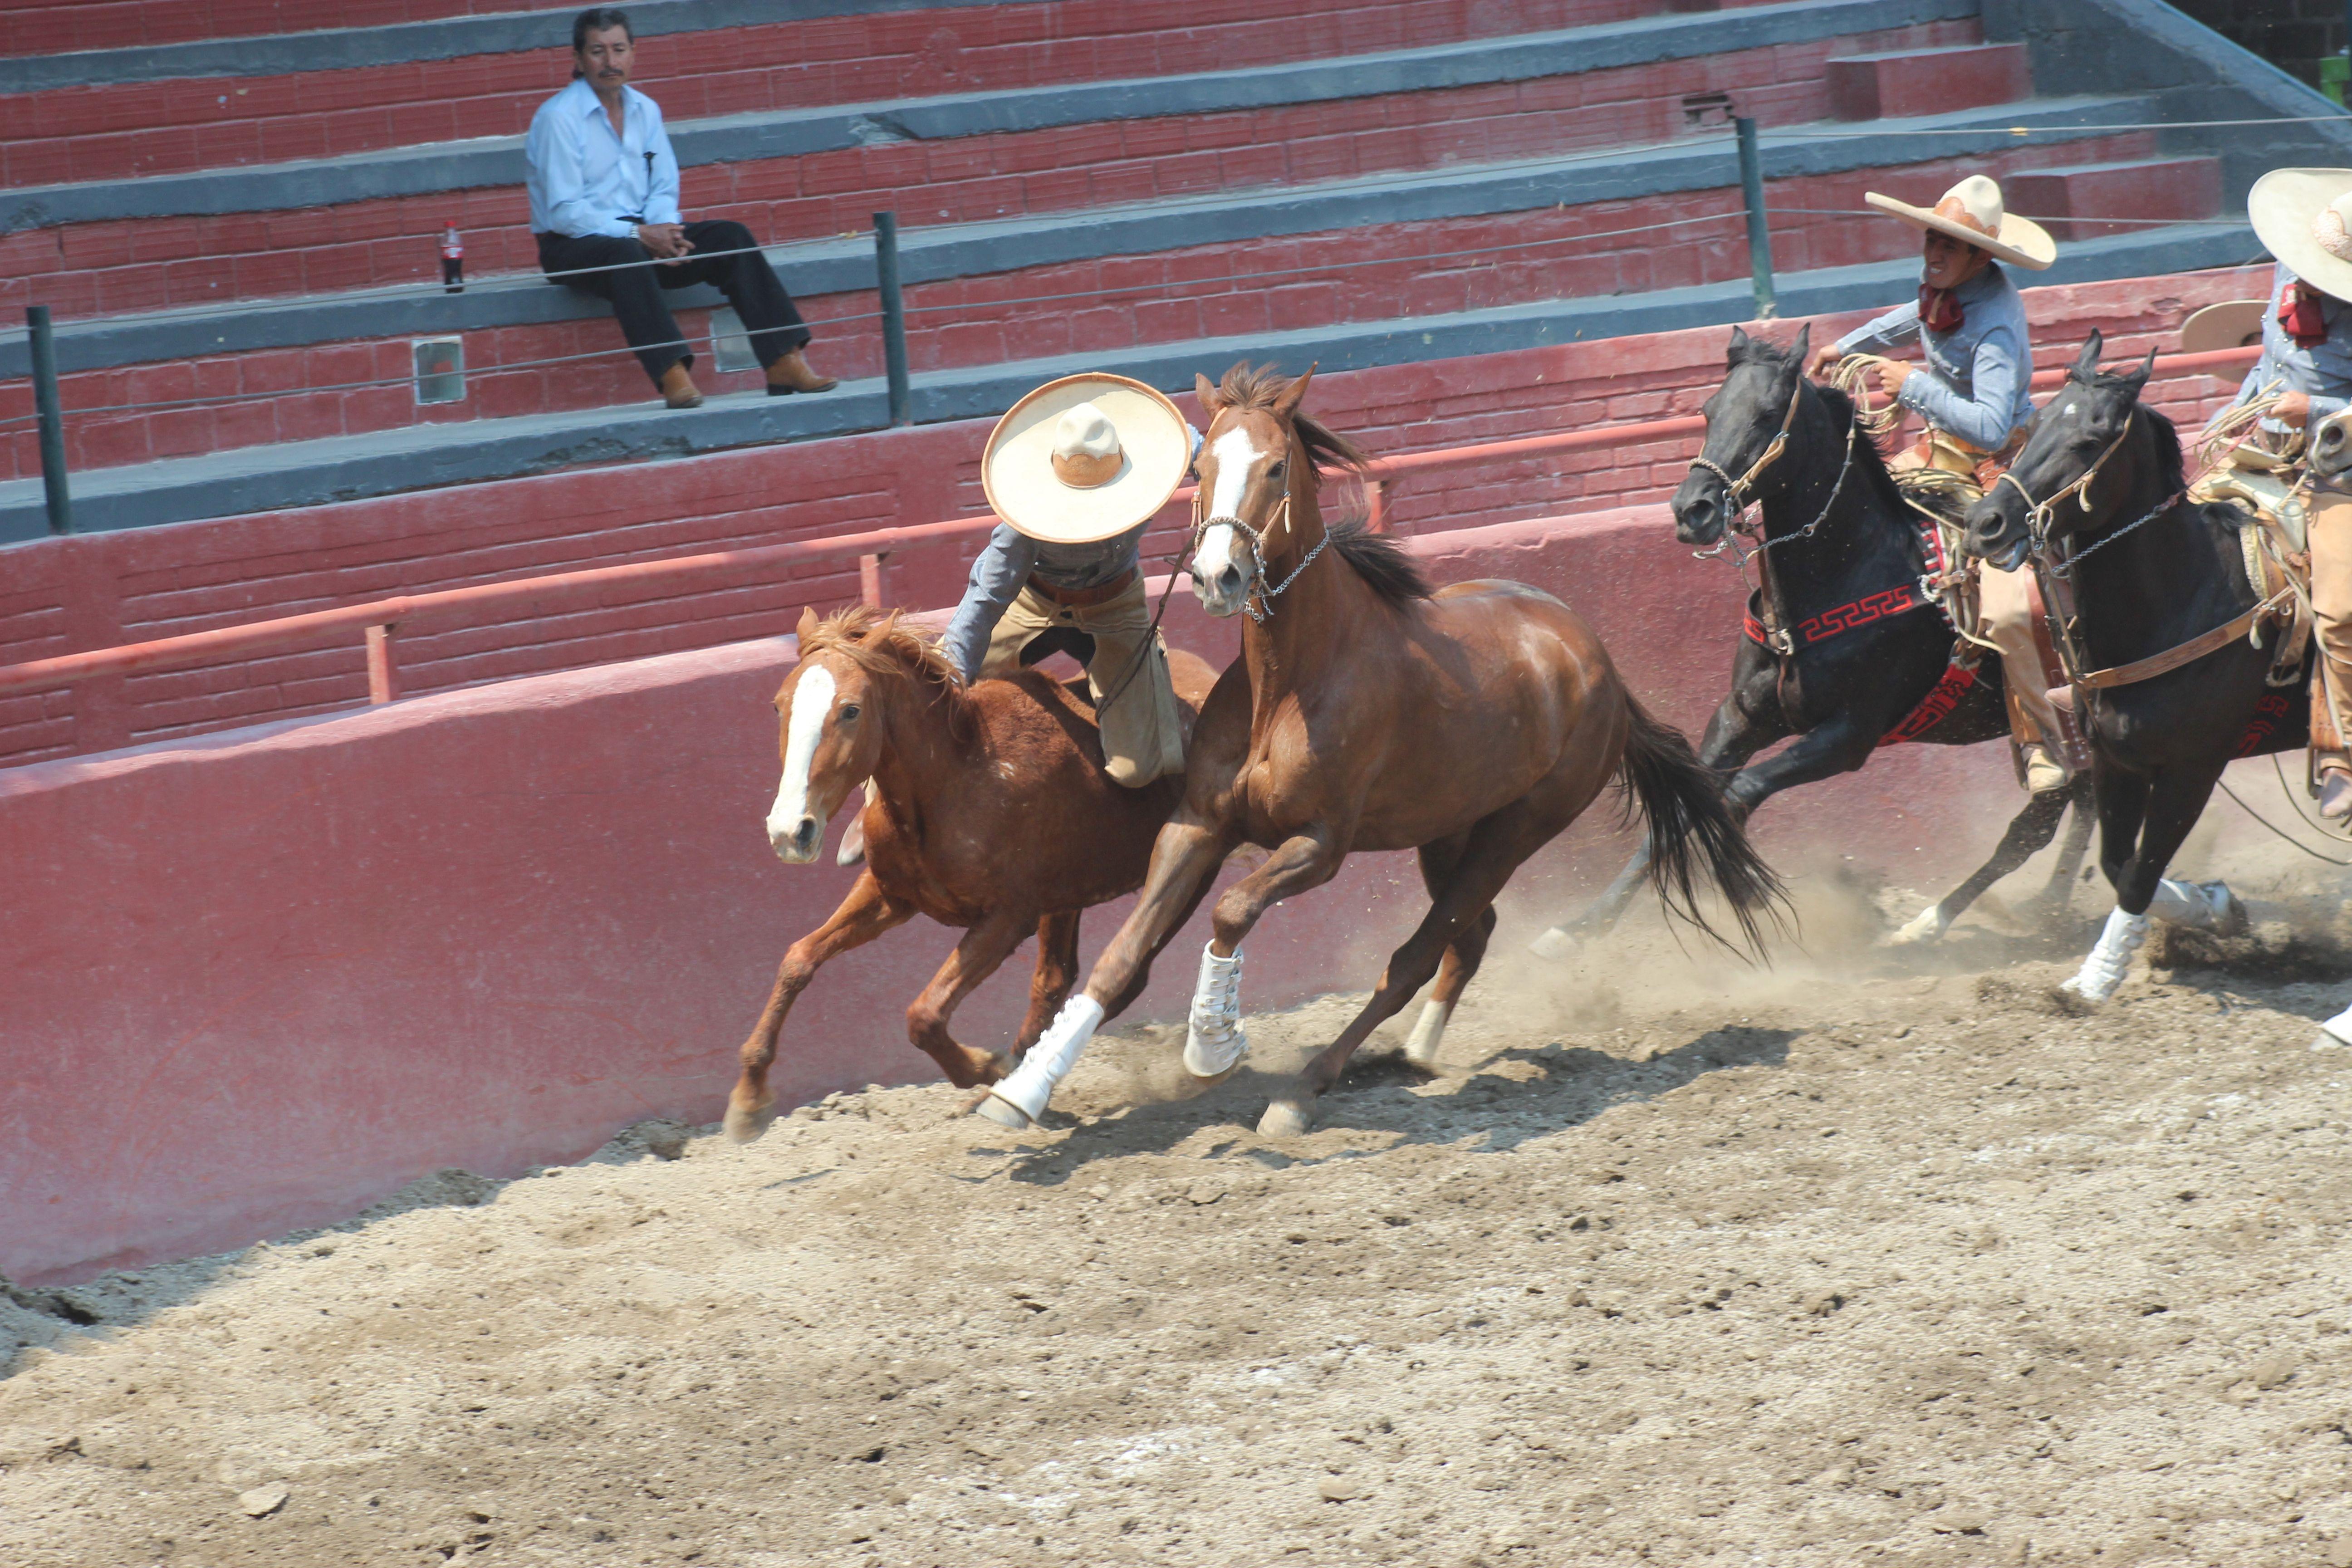 Lienzo Charro en Tlaxcala de Xicohtencatl, Tlaxcala